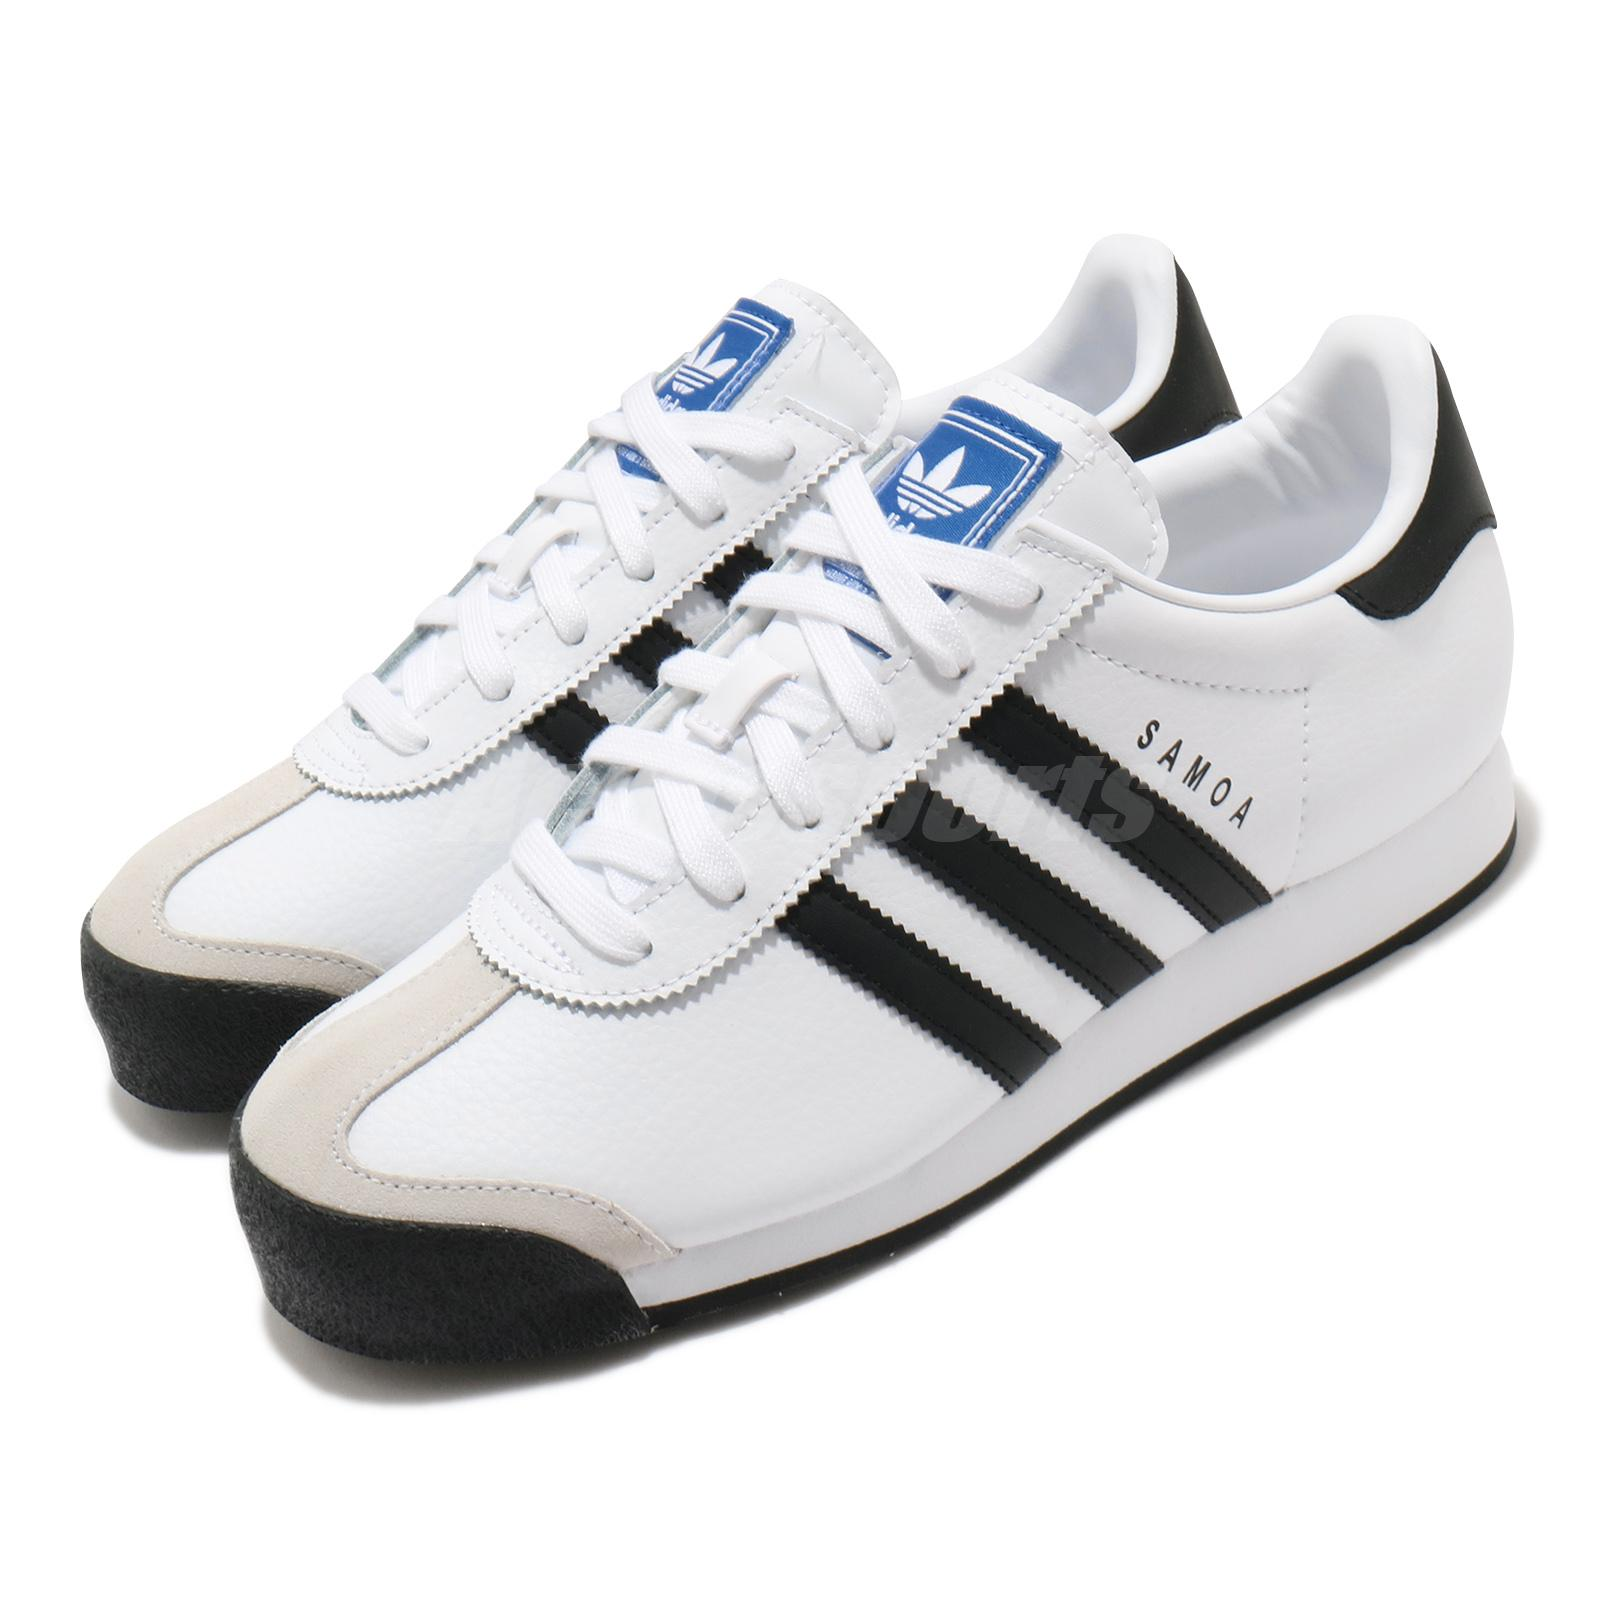 adidas Originals Samoa White Black Mens